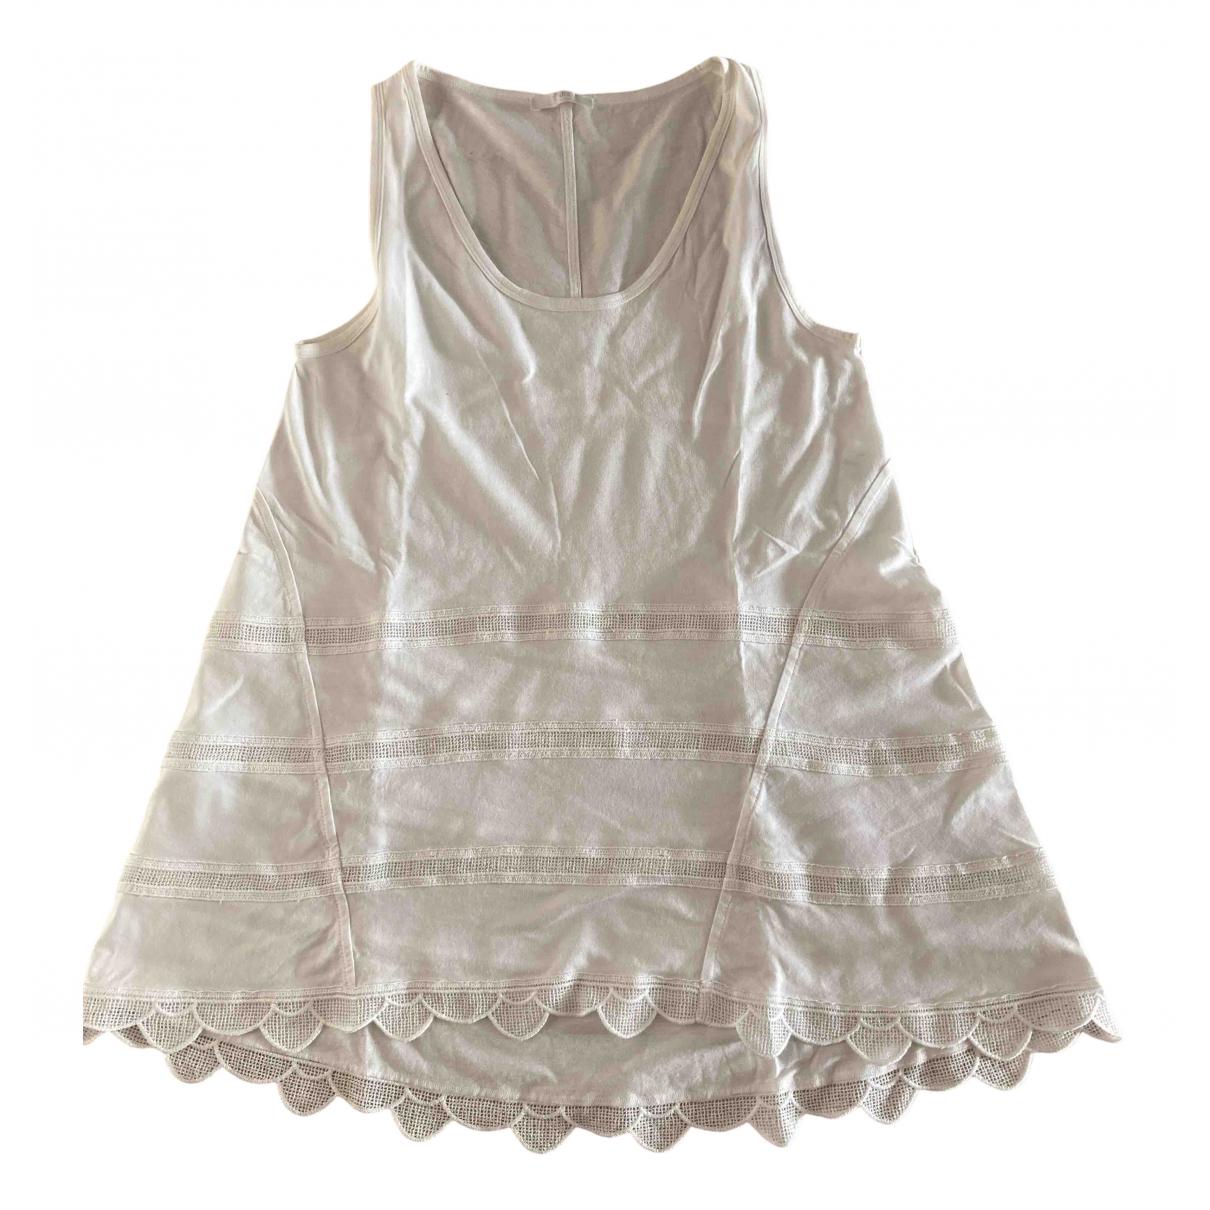 Chloé \N White Cotton  top for Women S International